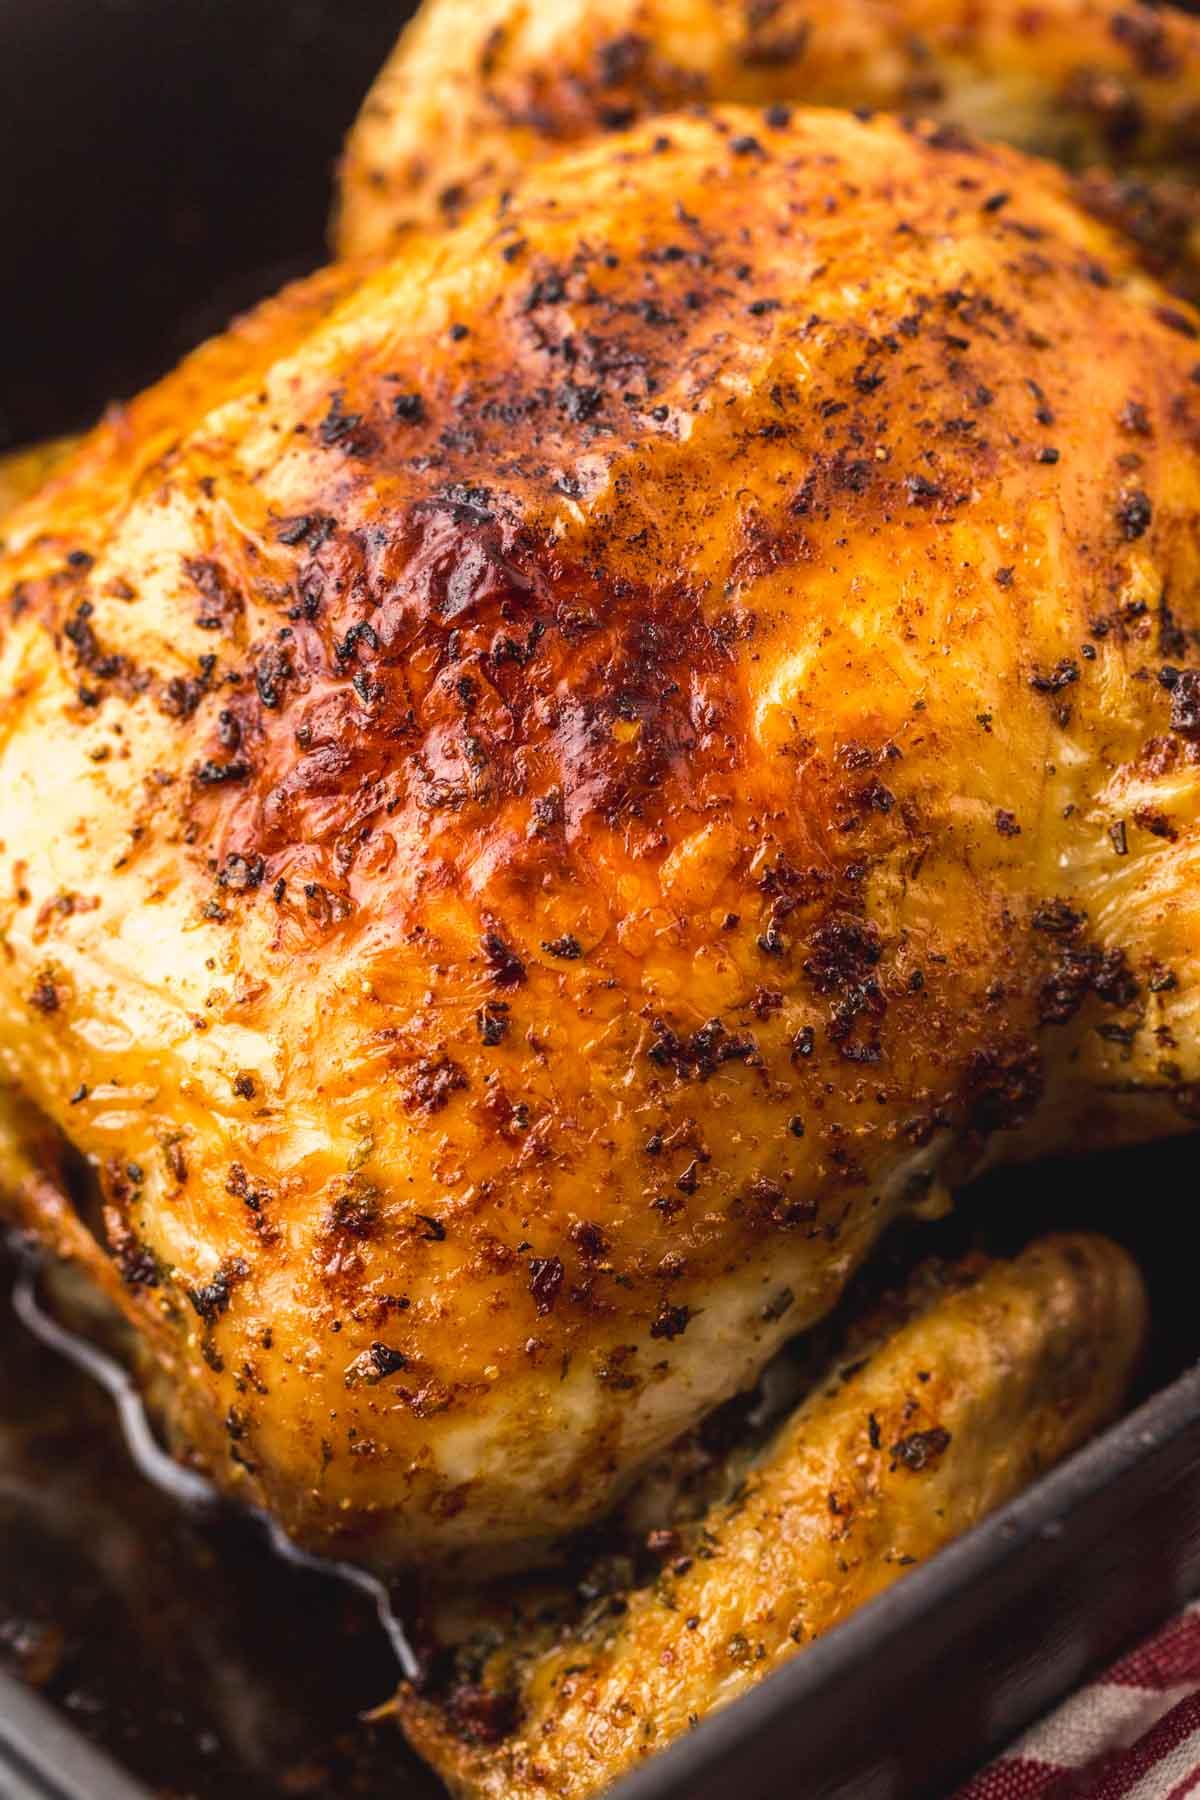 Close up of crispy golden roast chicken skin.